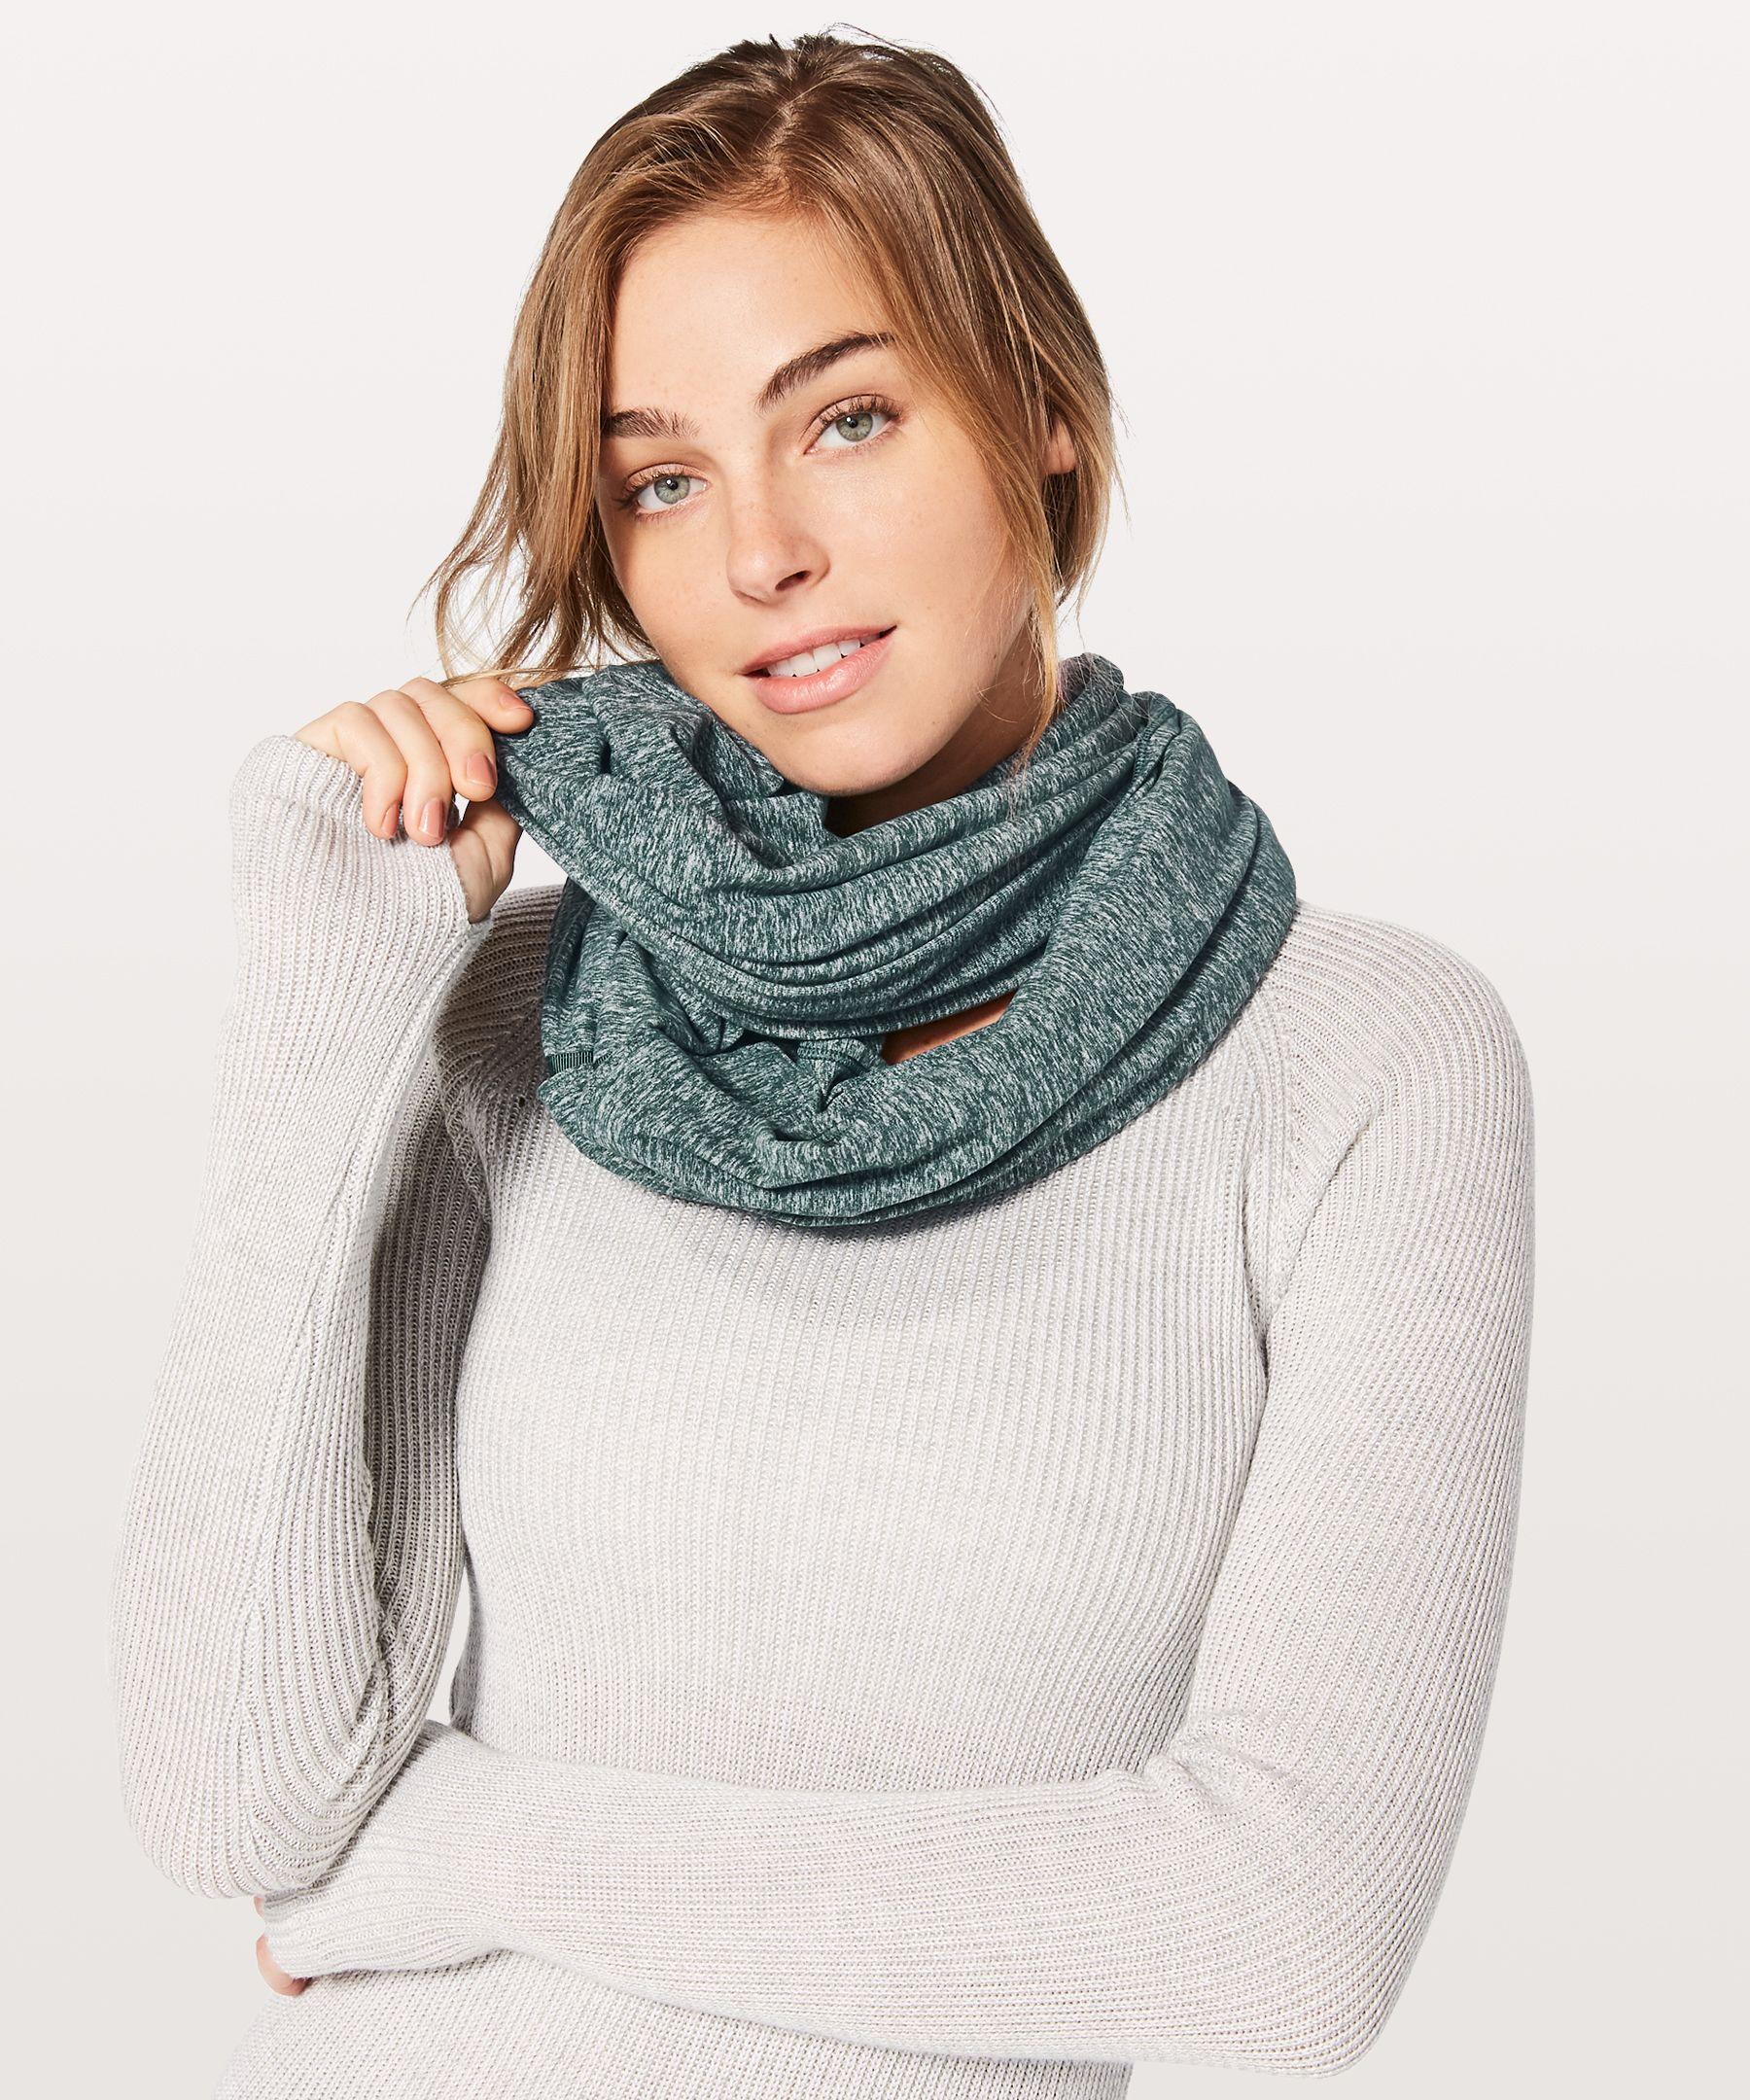 Vinyasa Scarf *Rulu | Women's Scarves & Gloves | lululemon